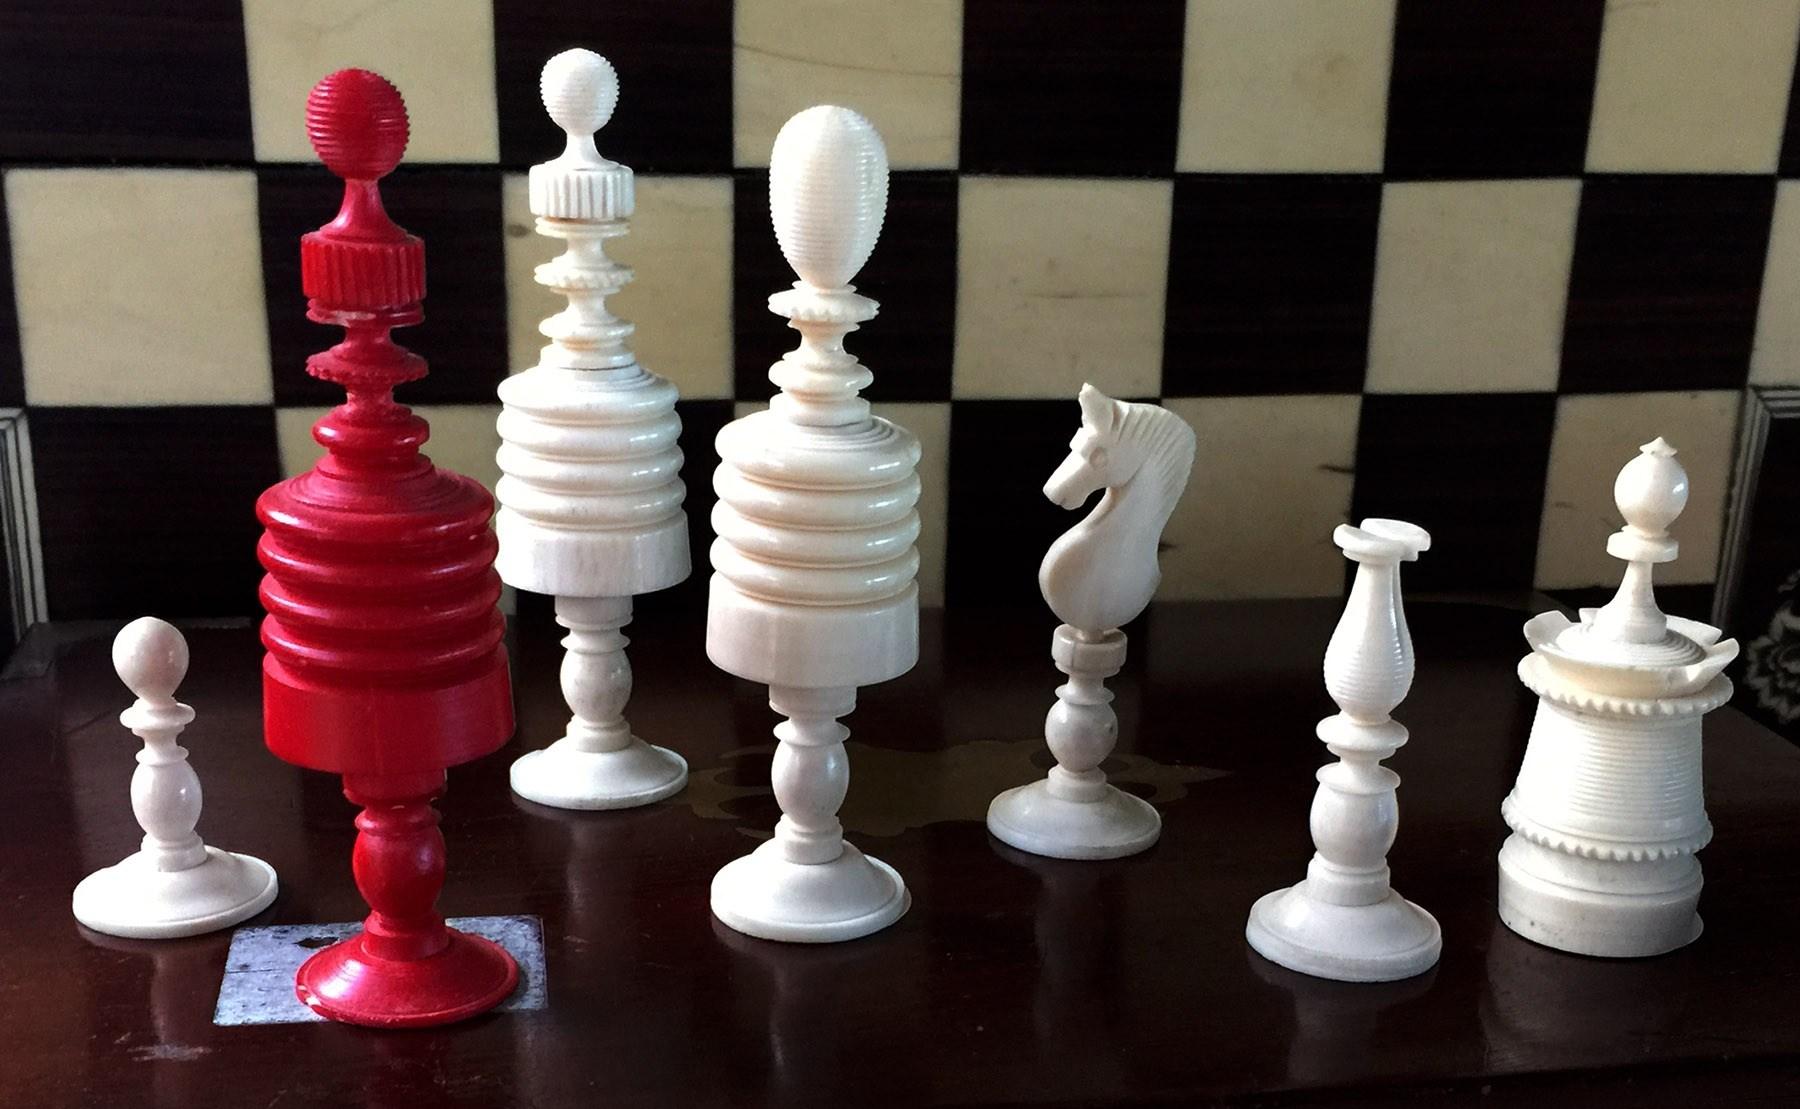 Type II Morphy Barleycorn Chess Set - www.ChessAntiques.com